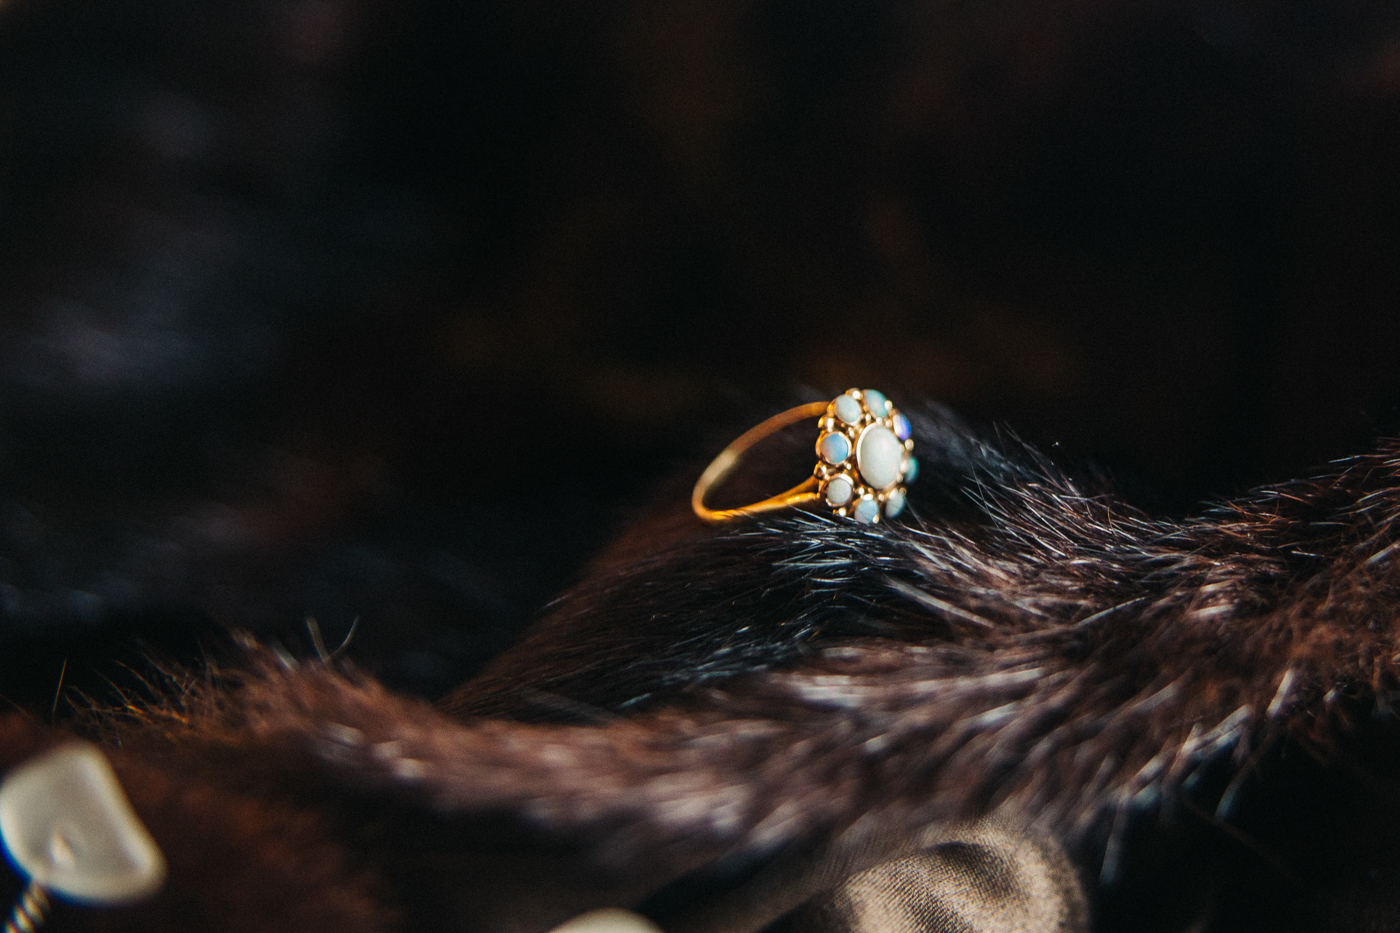 teesside-newcastle-gateshead-wedding-photography-photographer-creative-0005.jpg